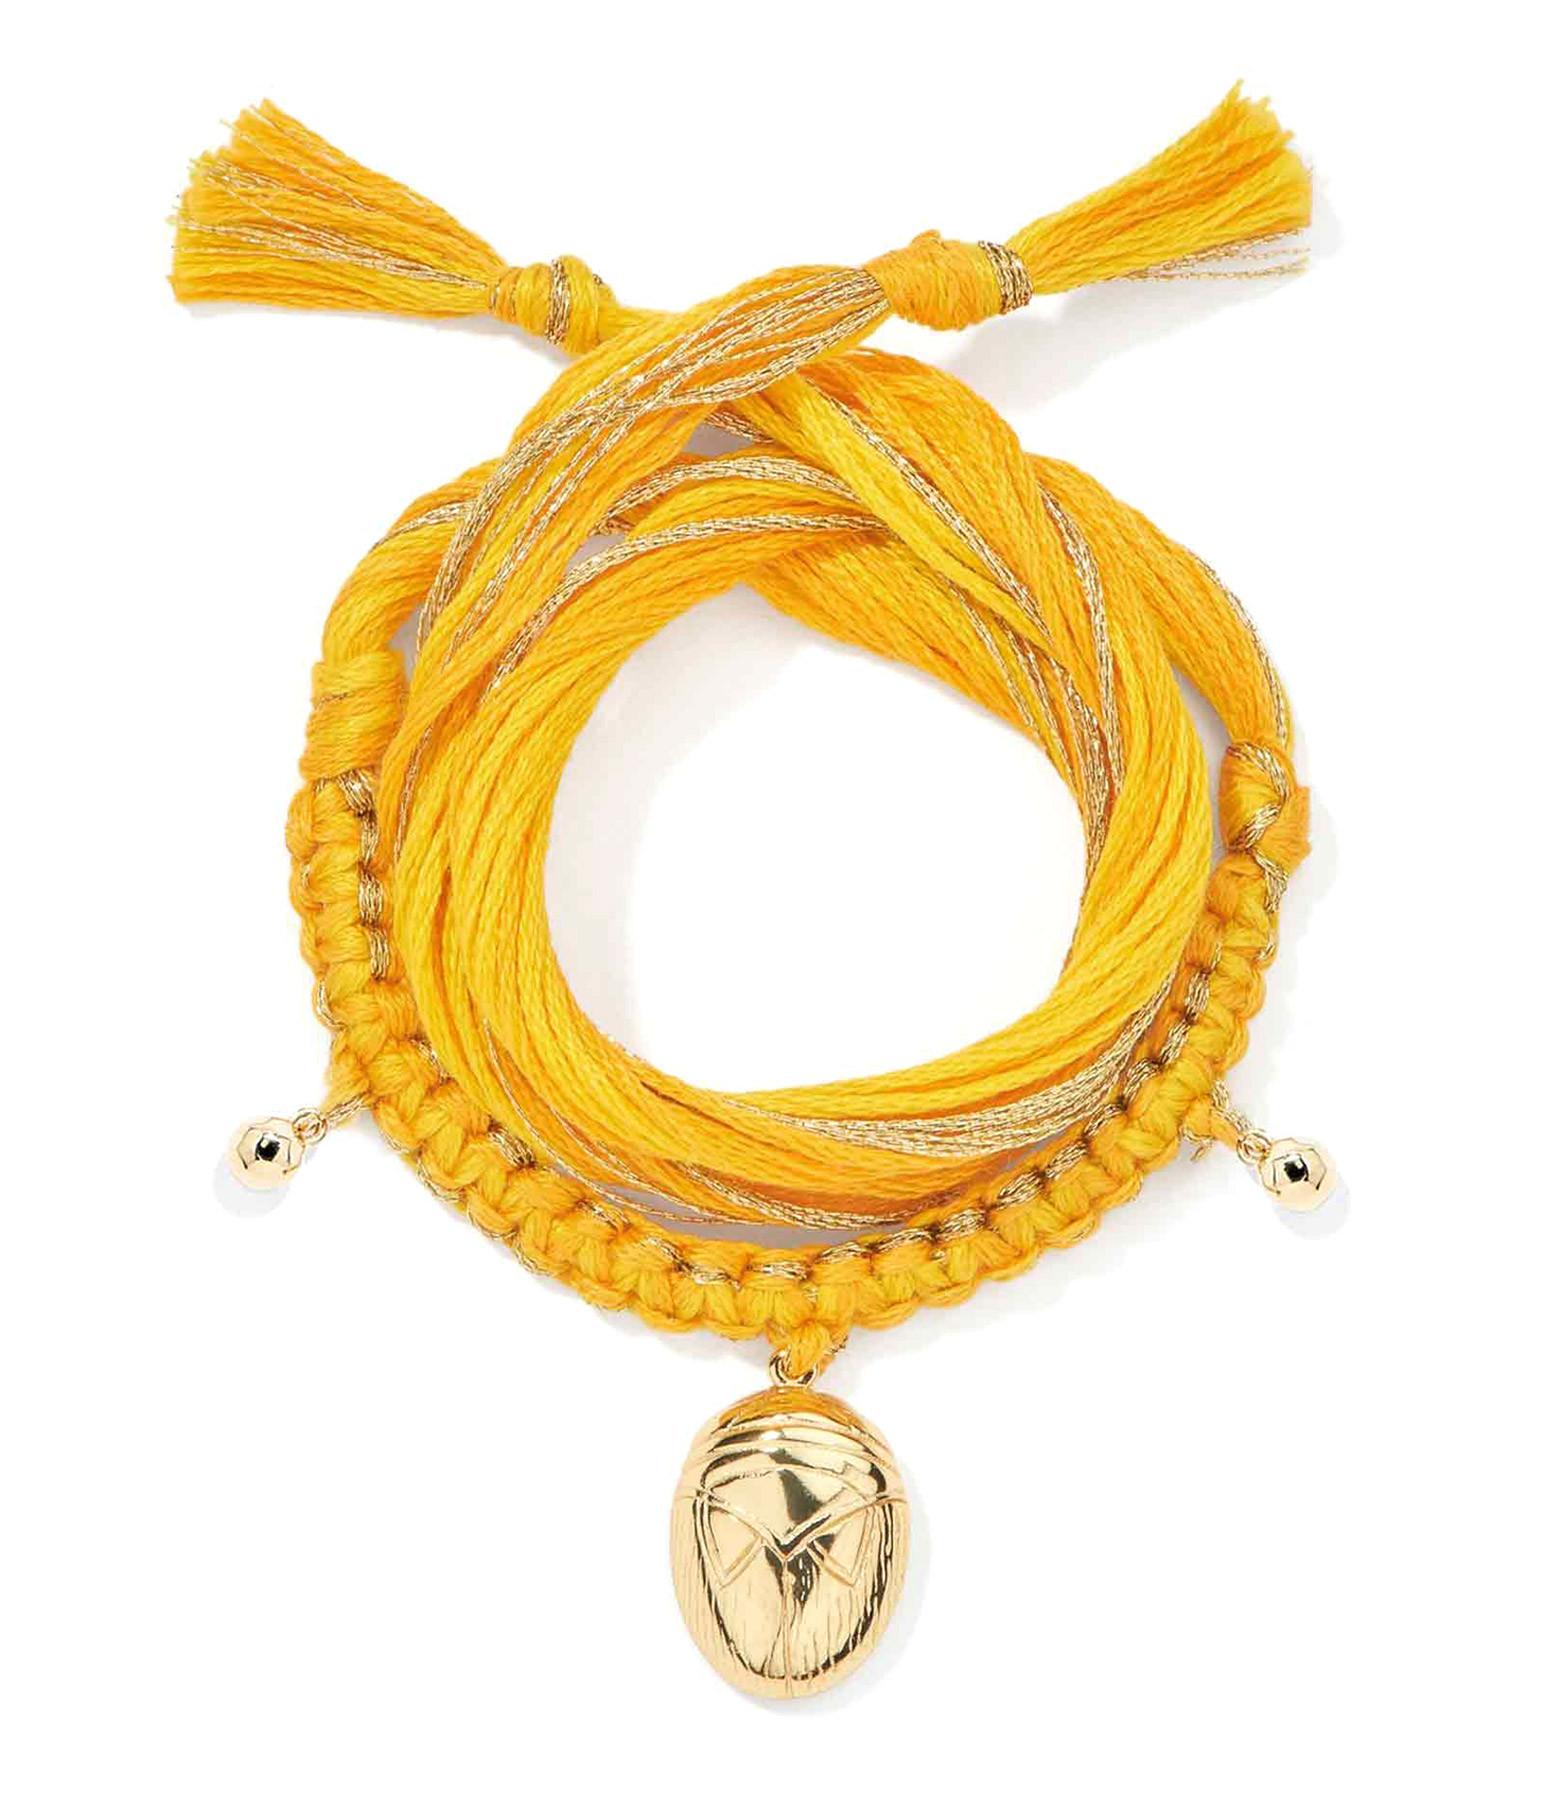 AURELIE BIDERMANN - Bracelet Honolulu Charm Scarabée Jaune Plaqué Or